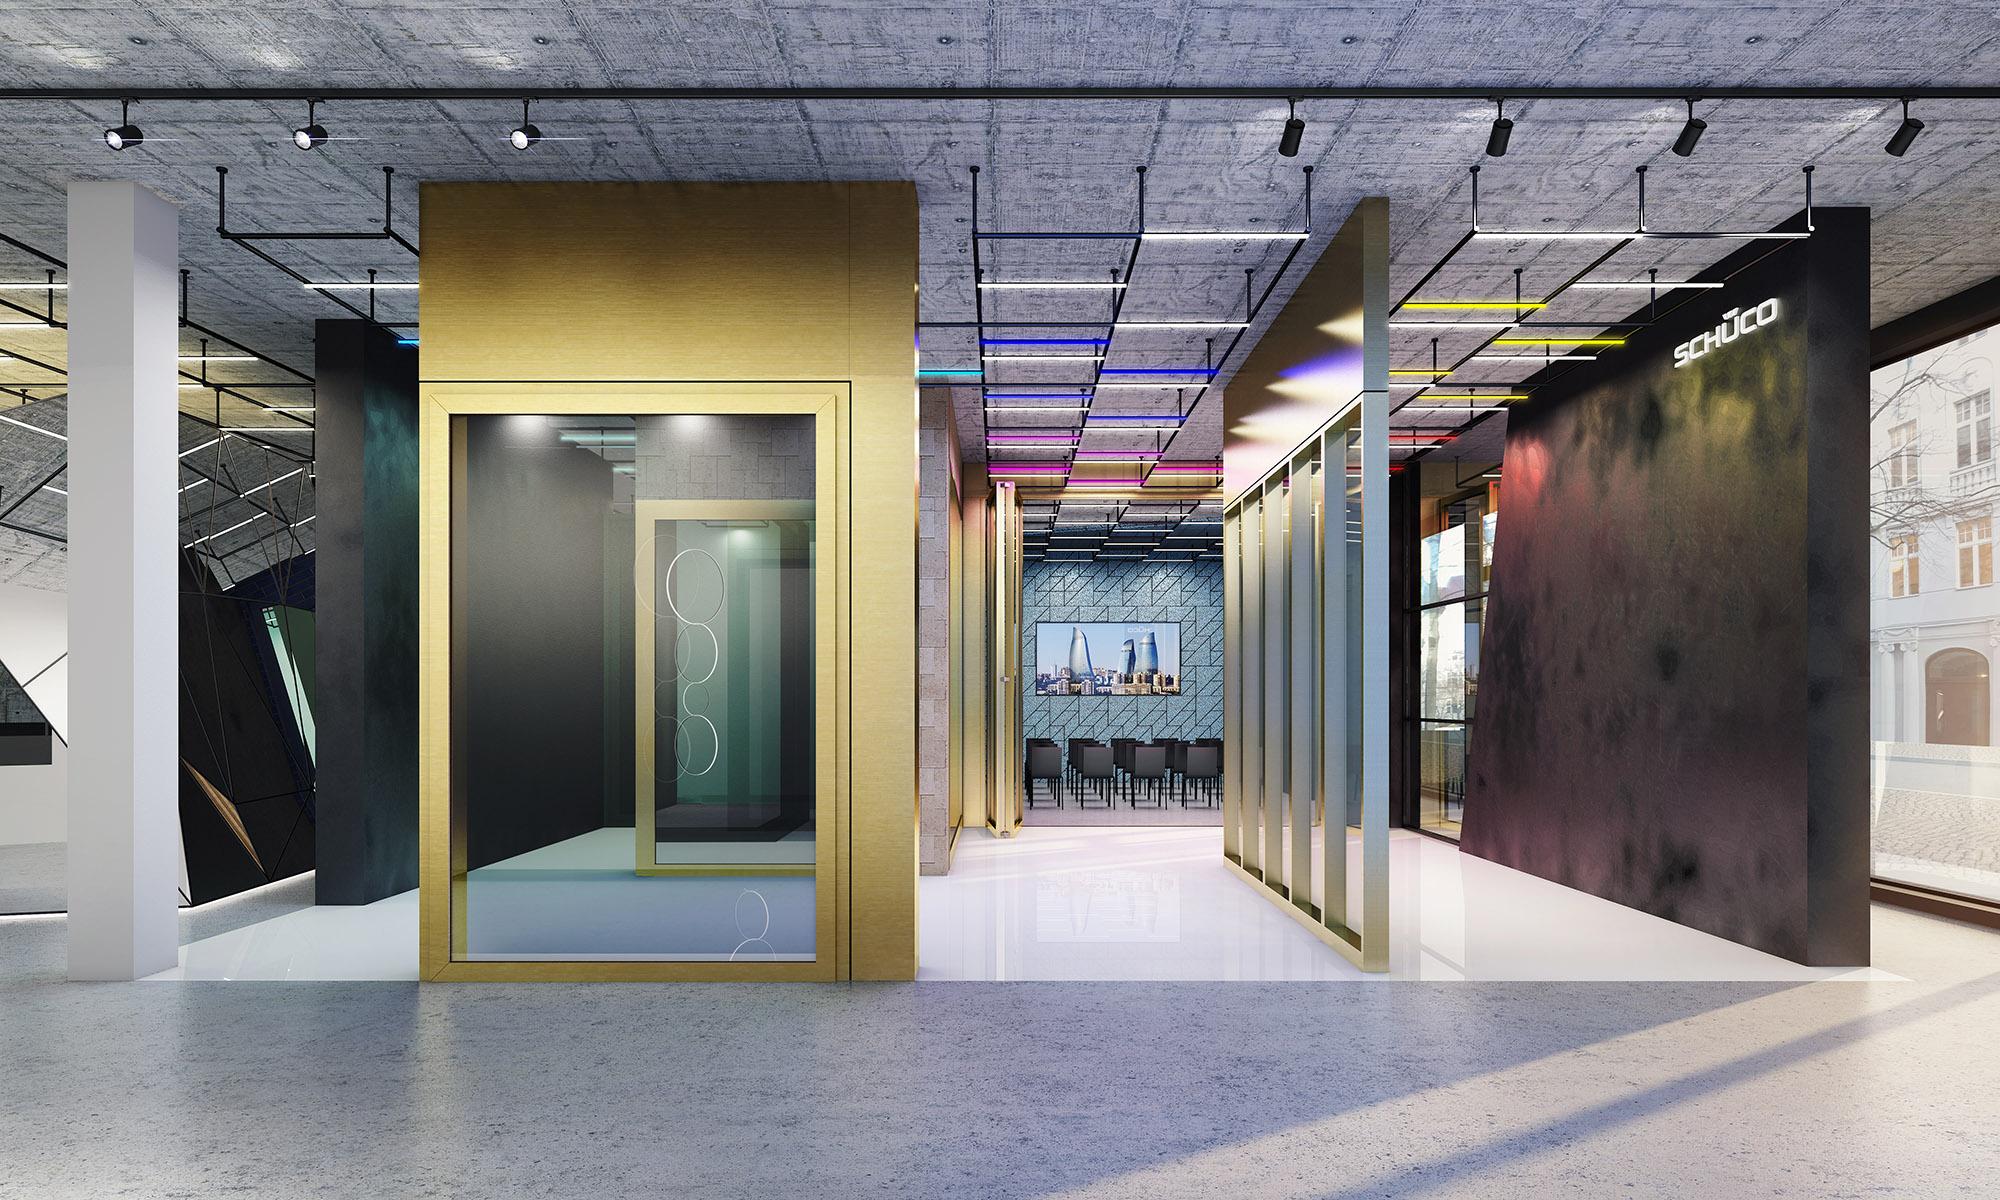 mojoimages architekturvisualisierung NordicOceanDesign Schueco Metropolitan Studio Berlin Objektbau 2018